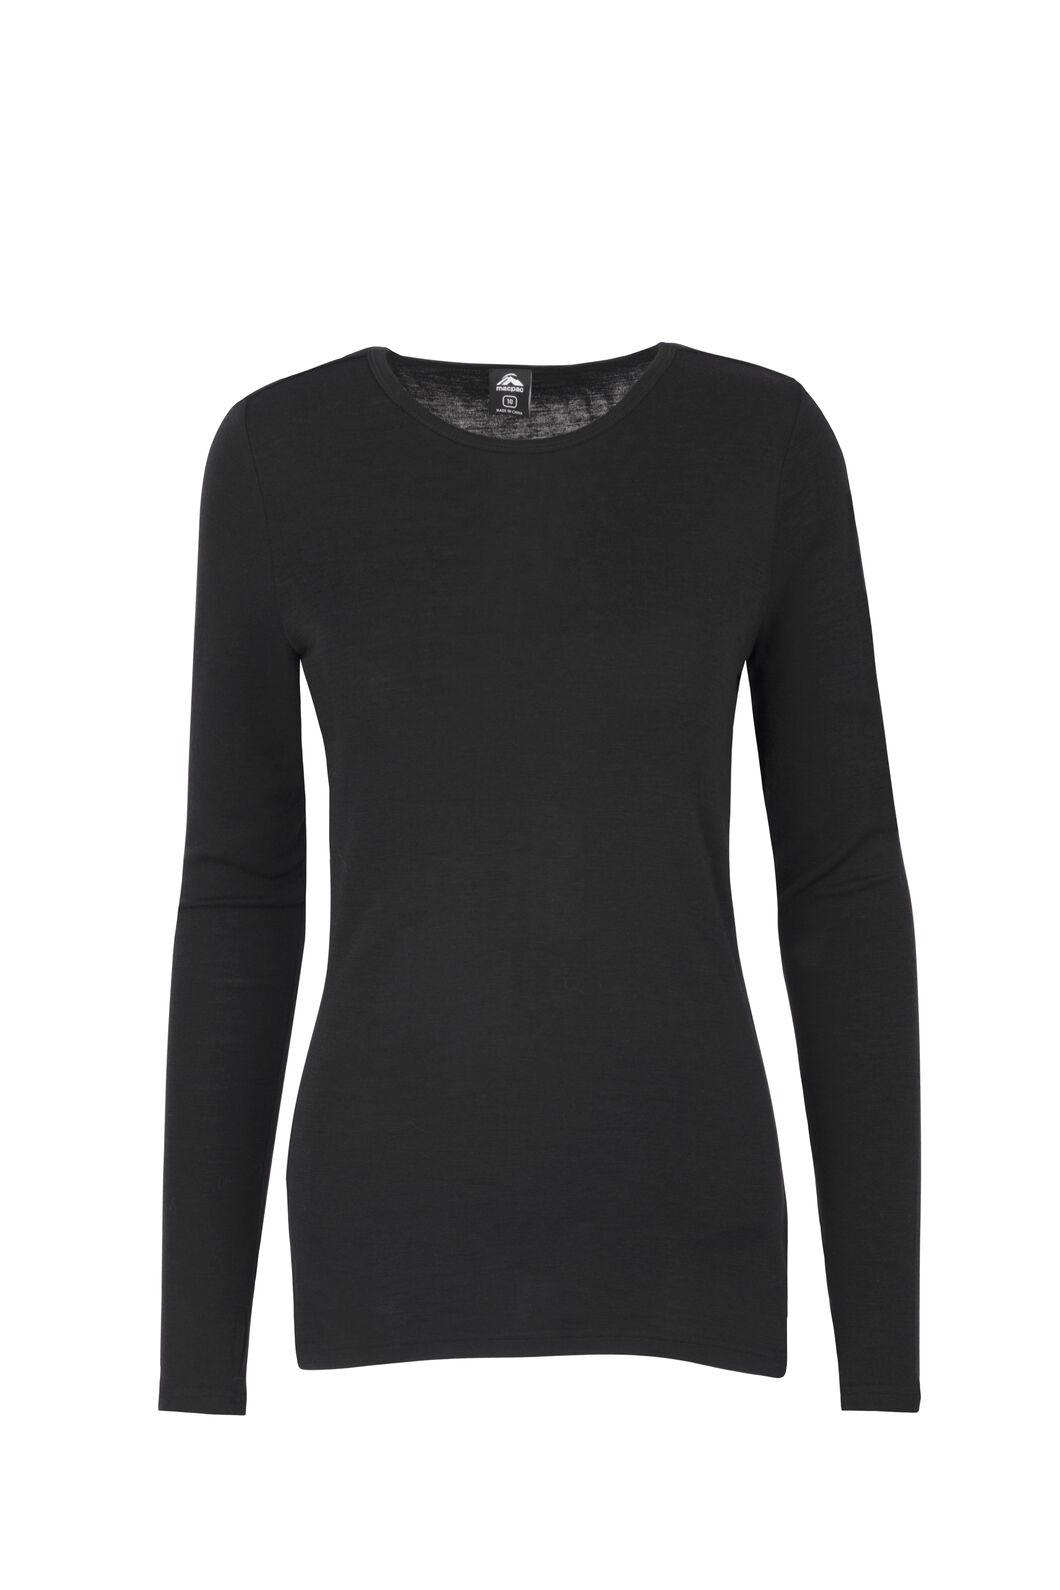 Macpac 220 Merino Long Sleeve Top — Women's, Black, hi-res